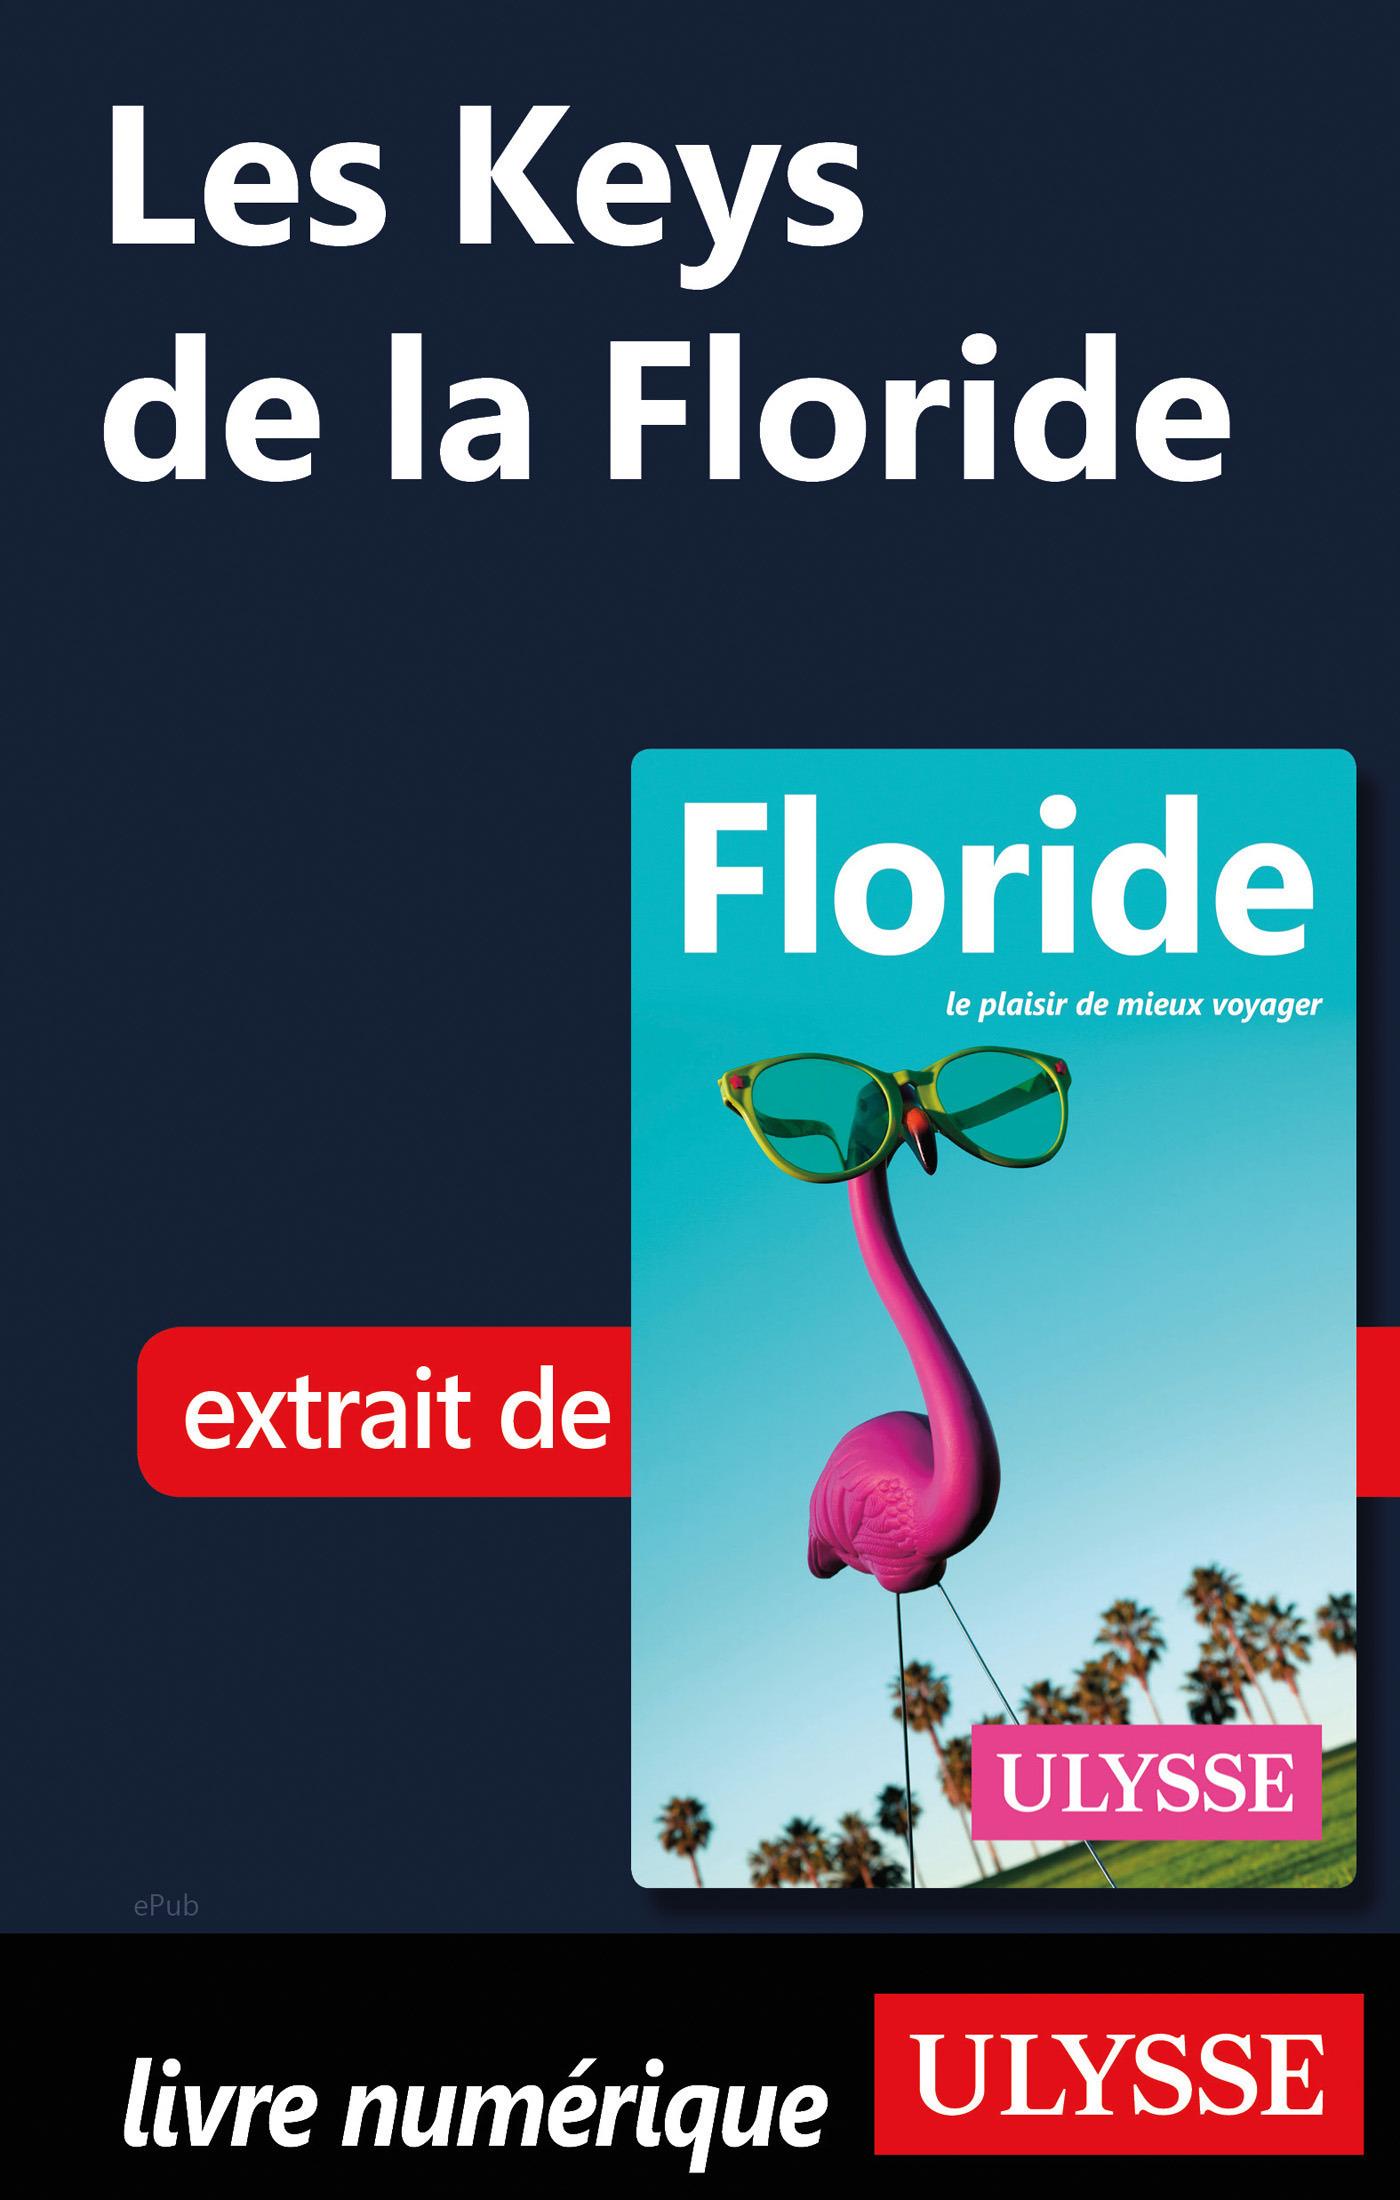 Les Keys de la Floride